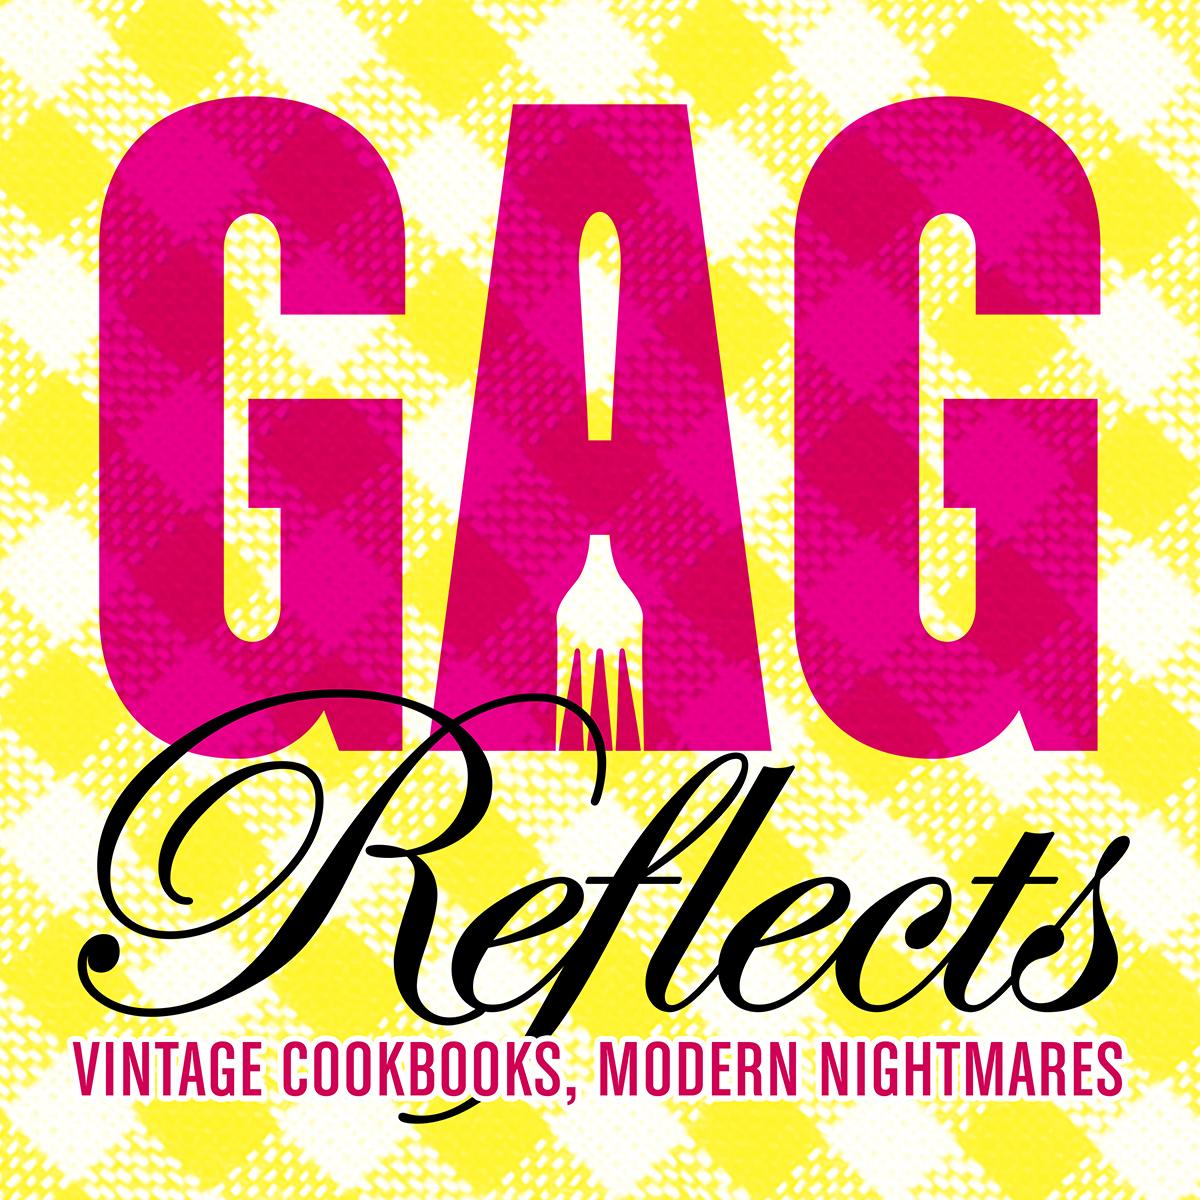 Blog — Gag Reflects